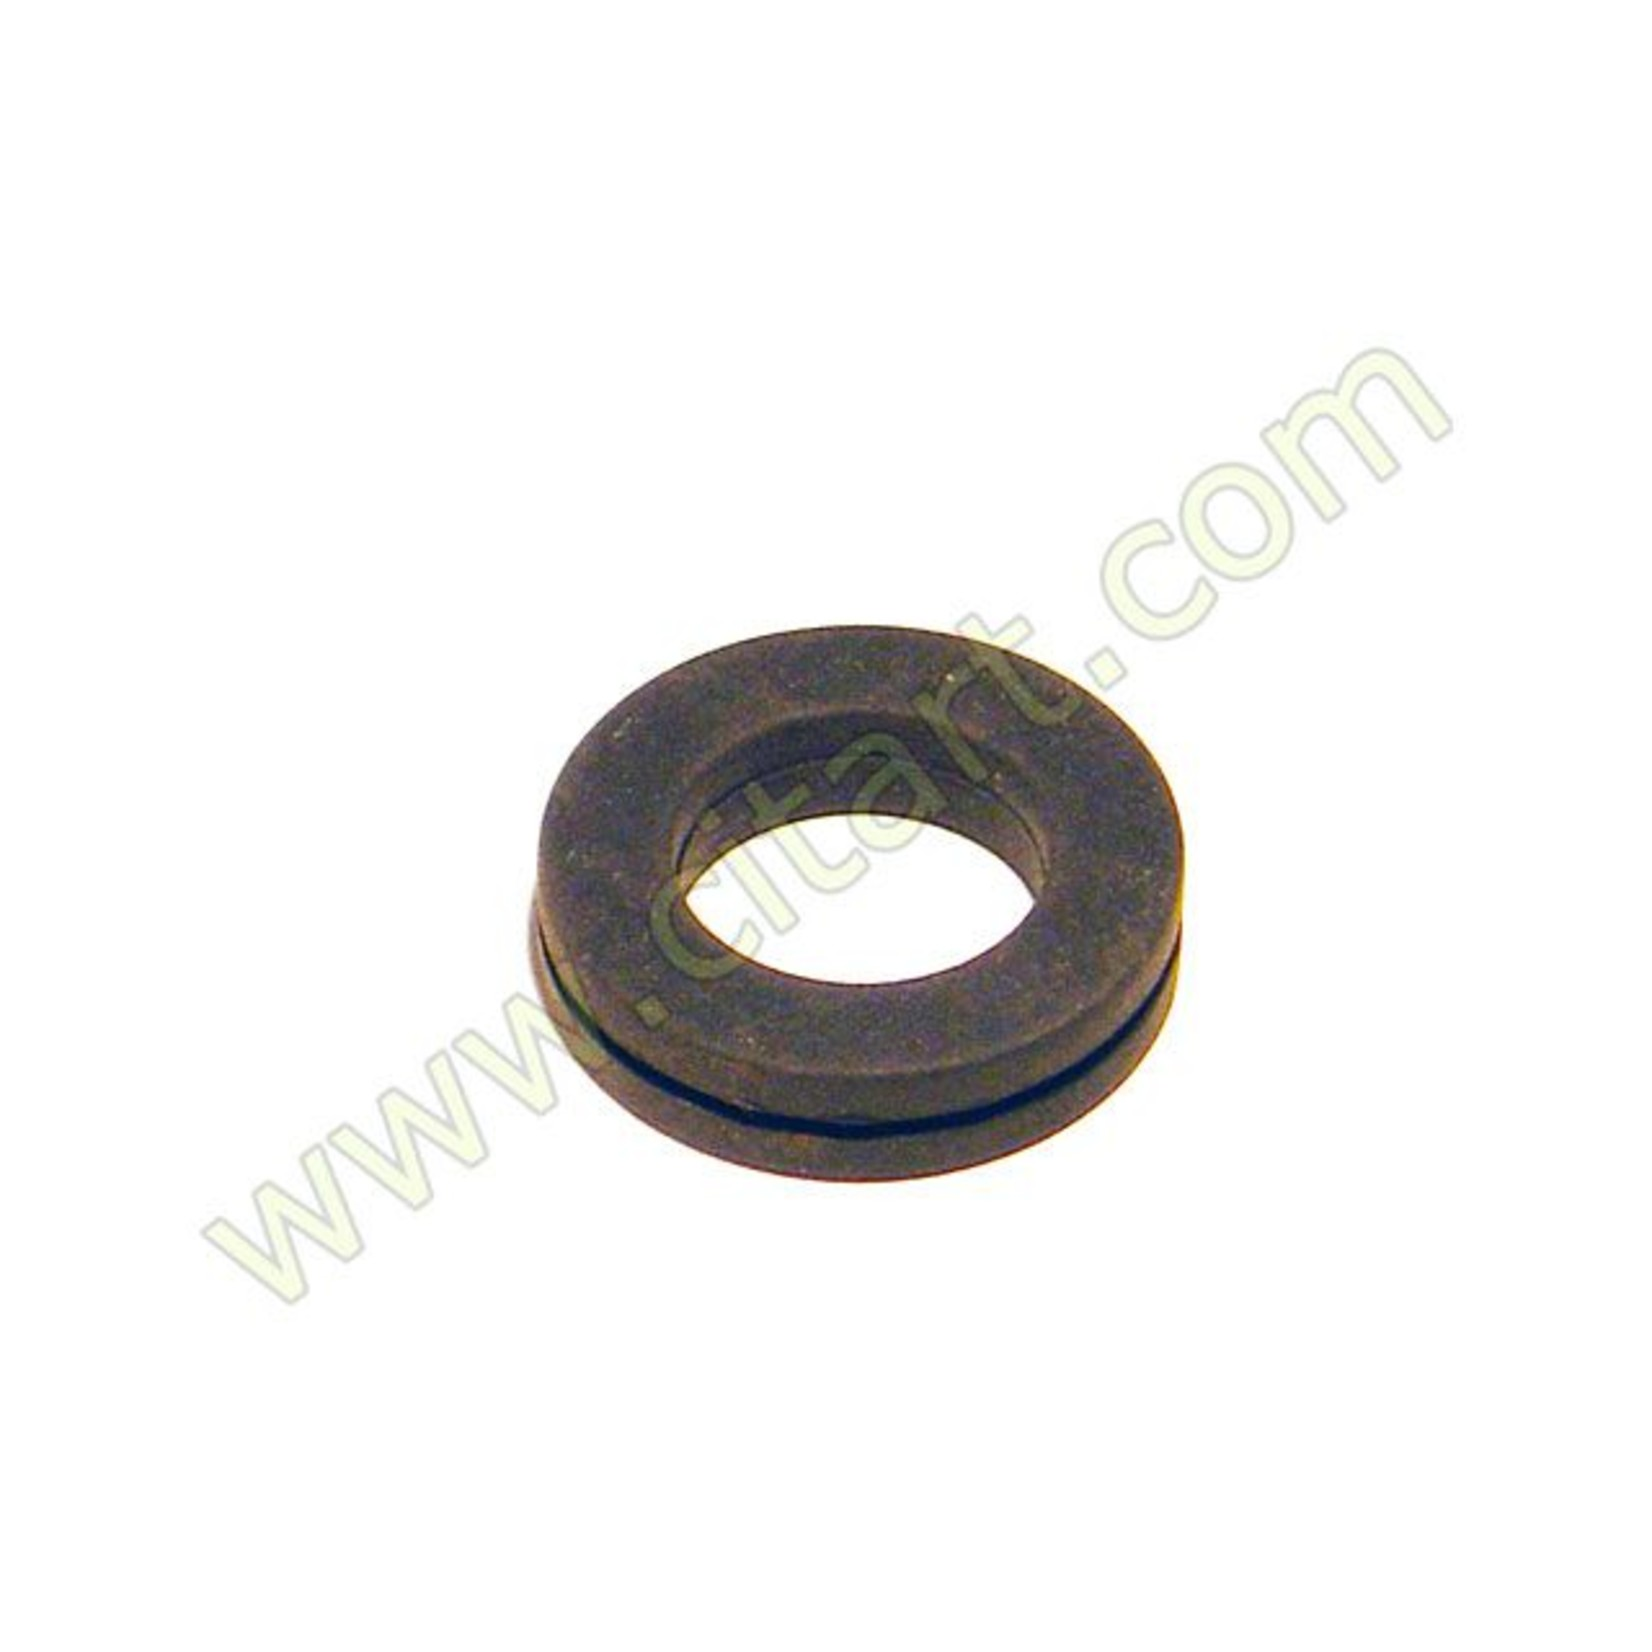 Manguito tubo caucho bomba presión alta - marco bateria Nr Org: 21065009